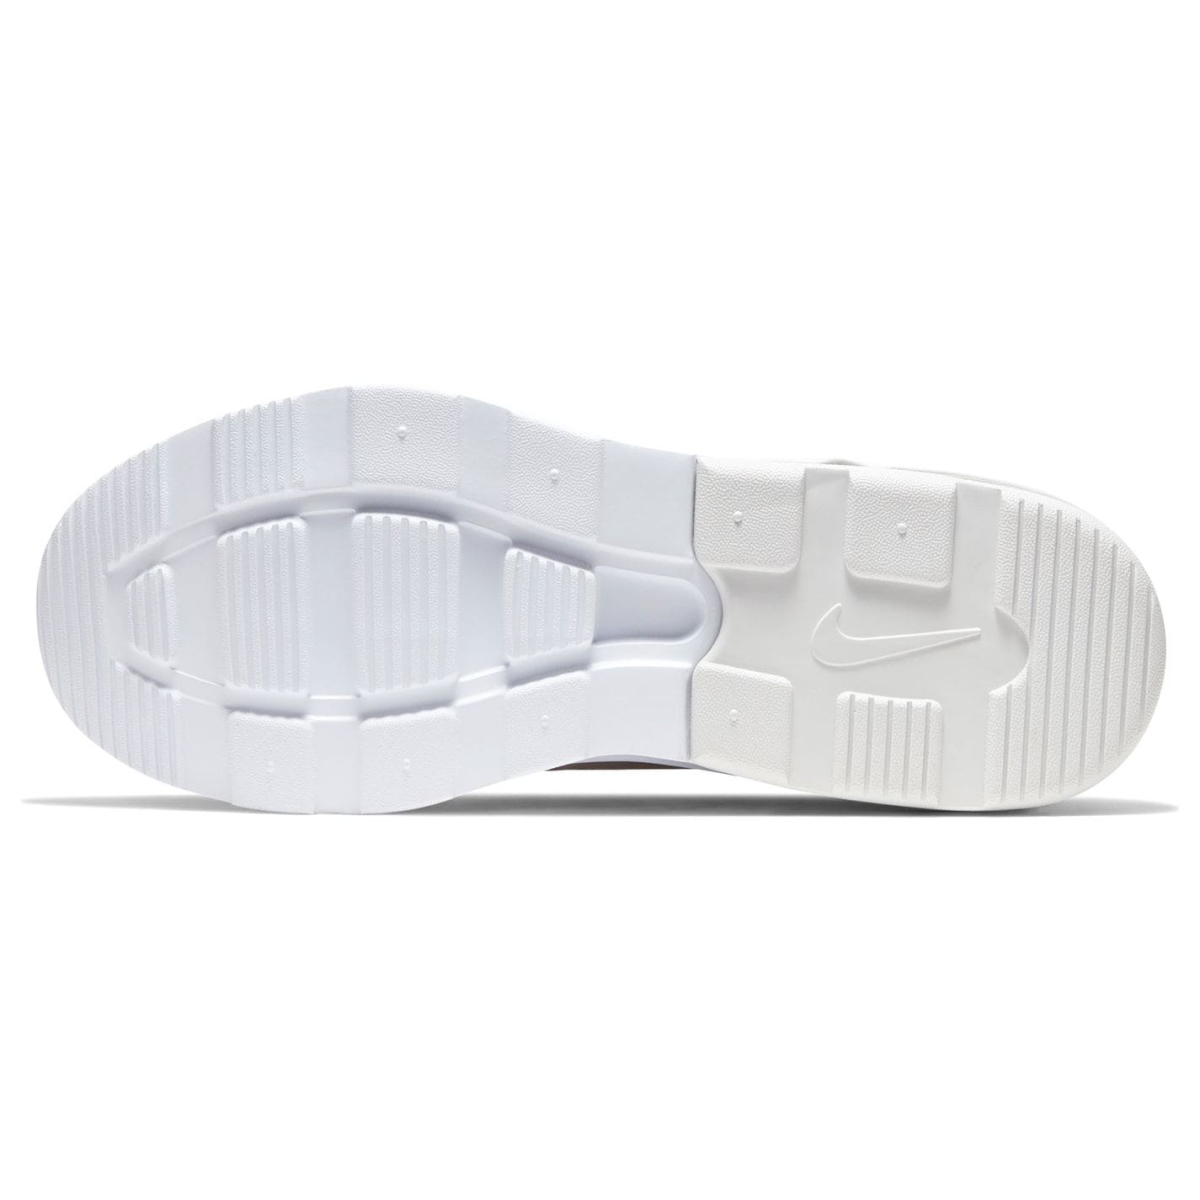 Nike-Air-Max-Motion-2-Turnschuhe-Damen-Sneaker-Sportschuhe-Laufschuhe-4024 Indexbild 8